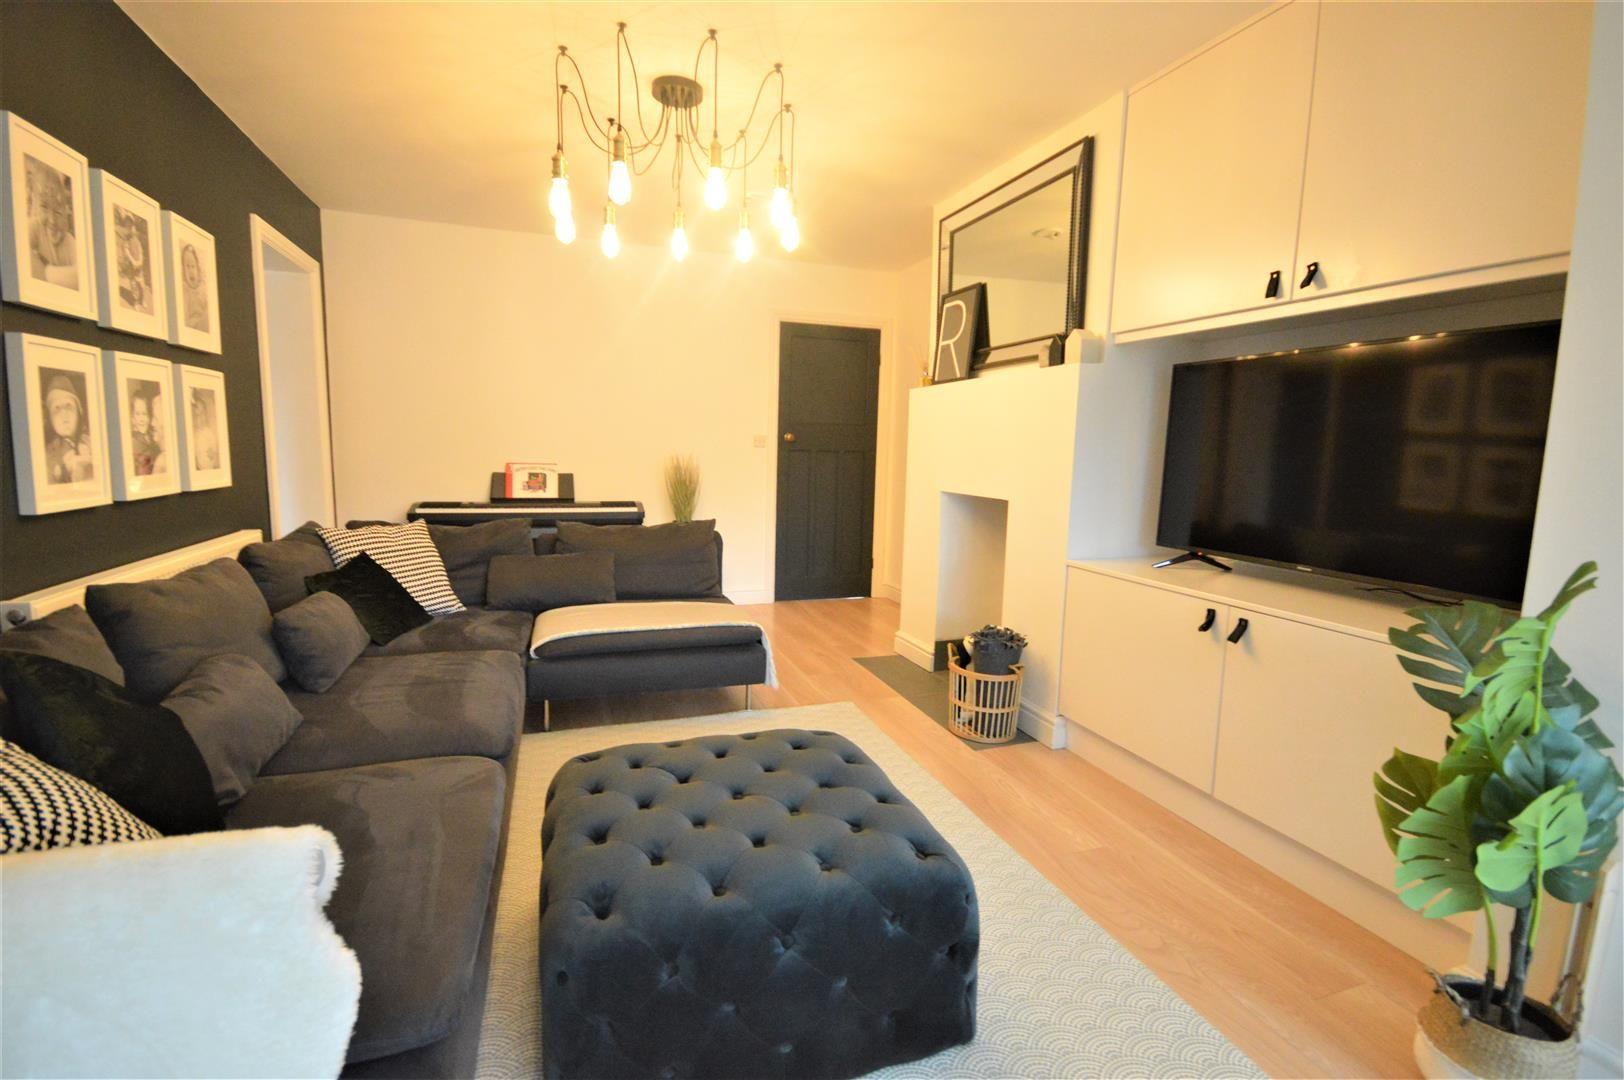 5 bed detached for sale in Leominster 6